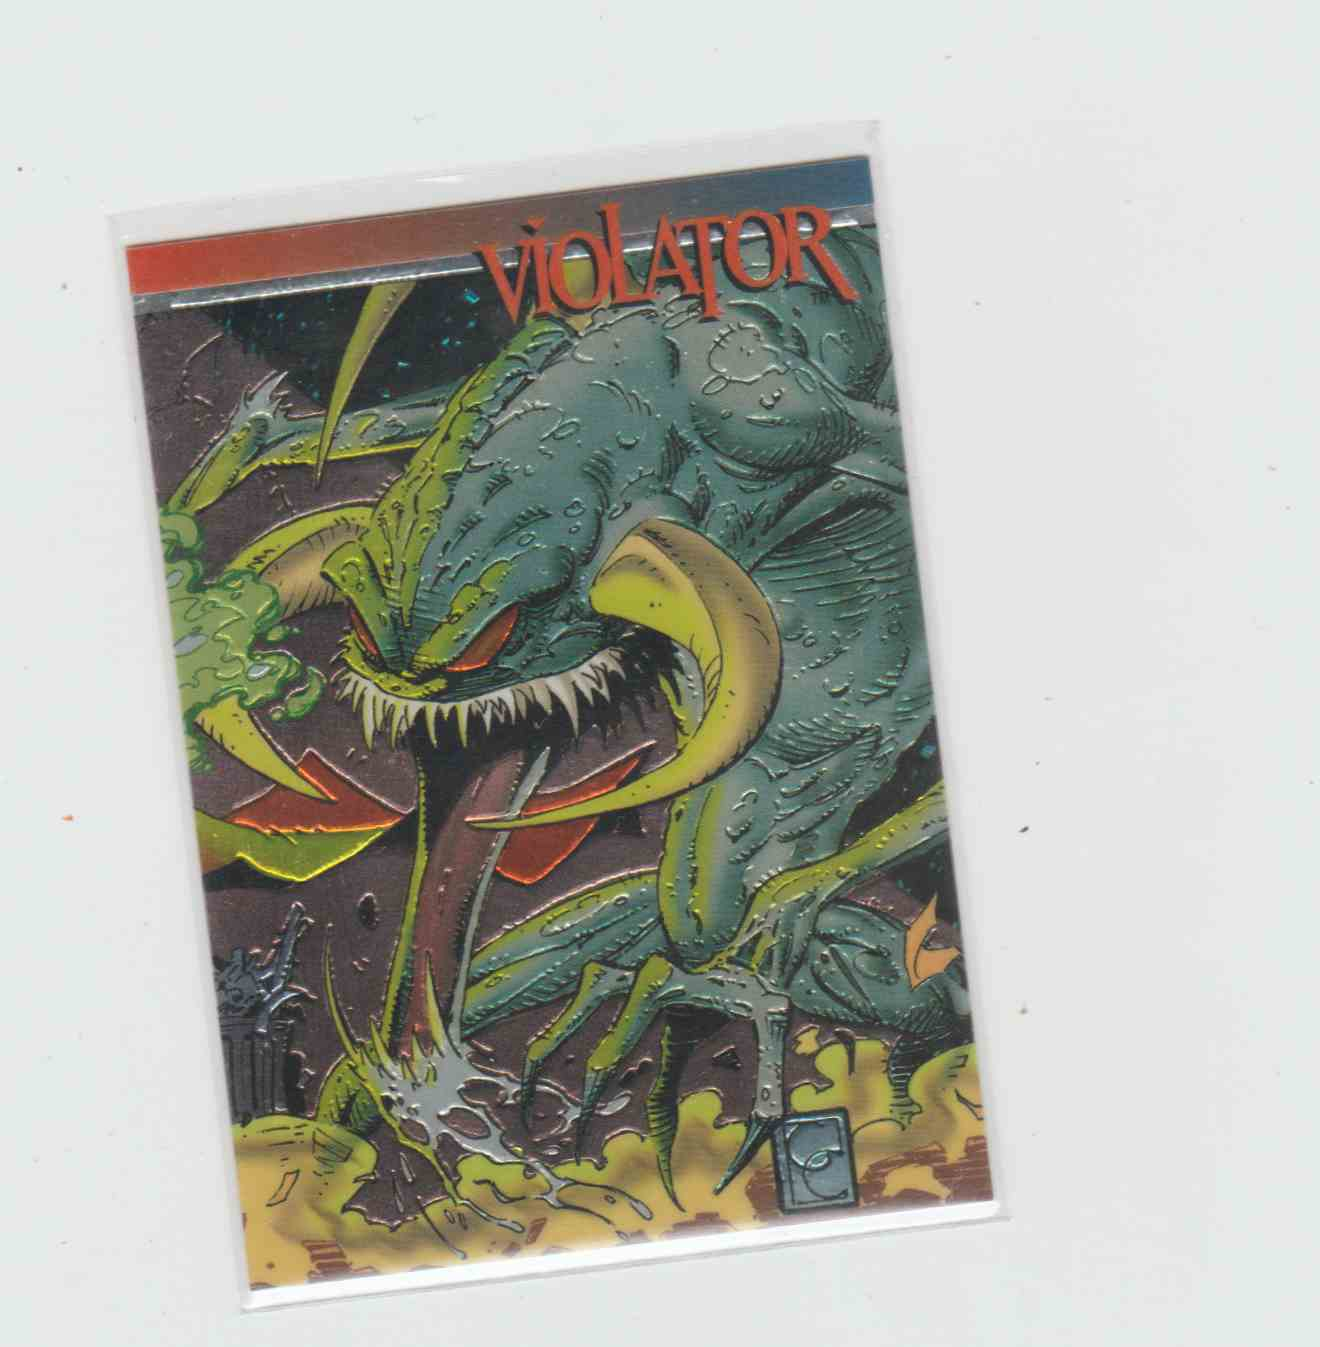 1993 Wizard Series III Todd McFarlane Violator #1 card front image